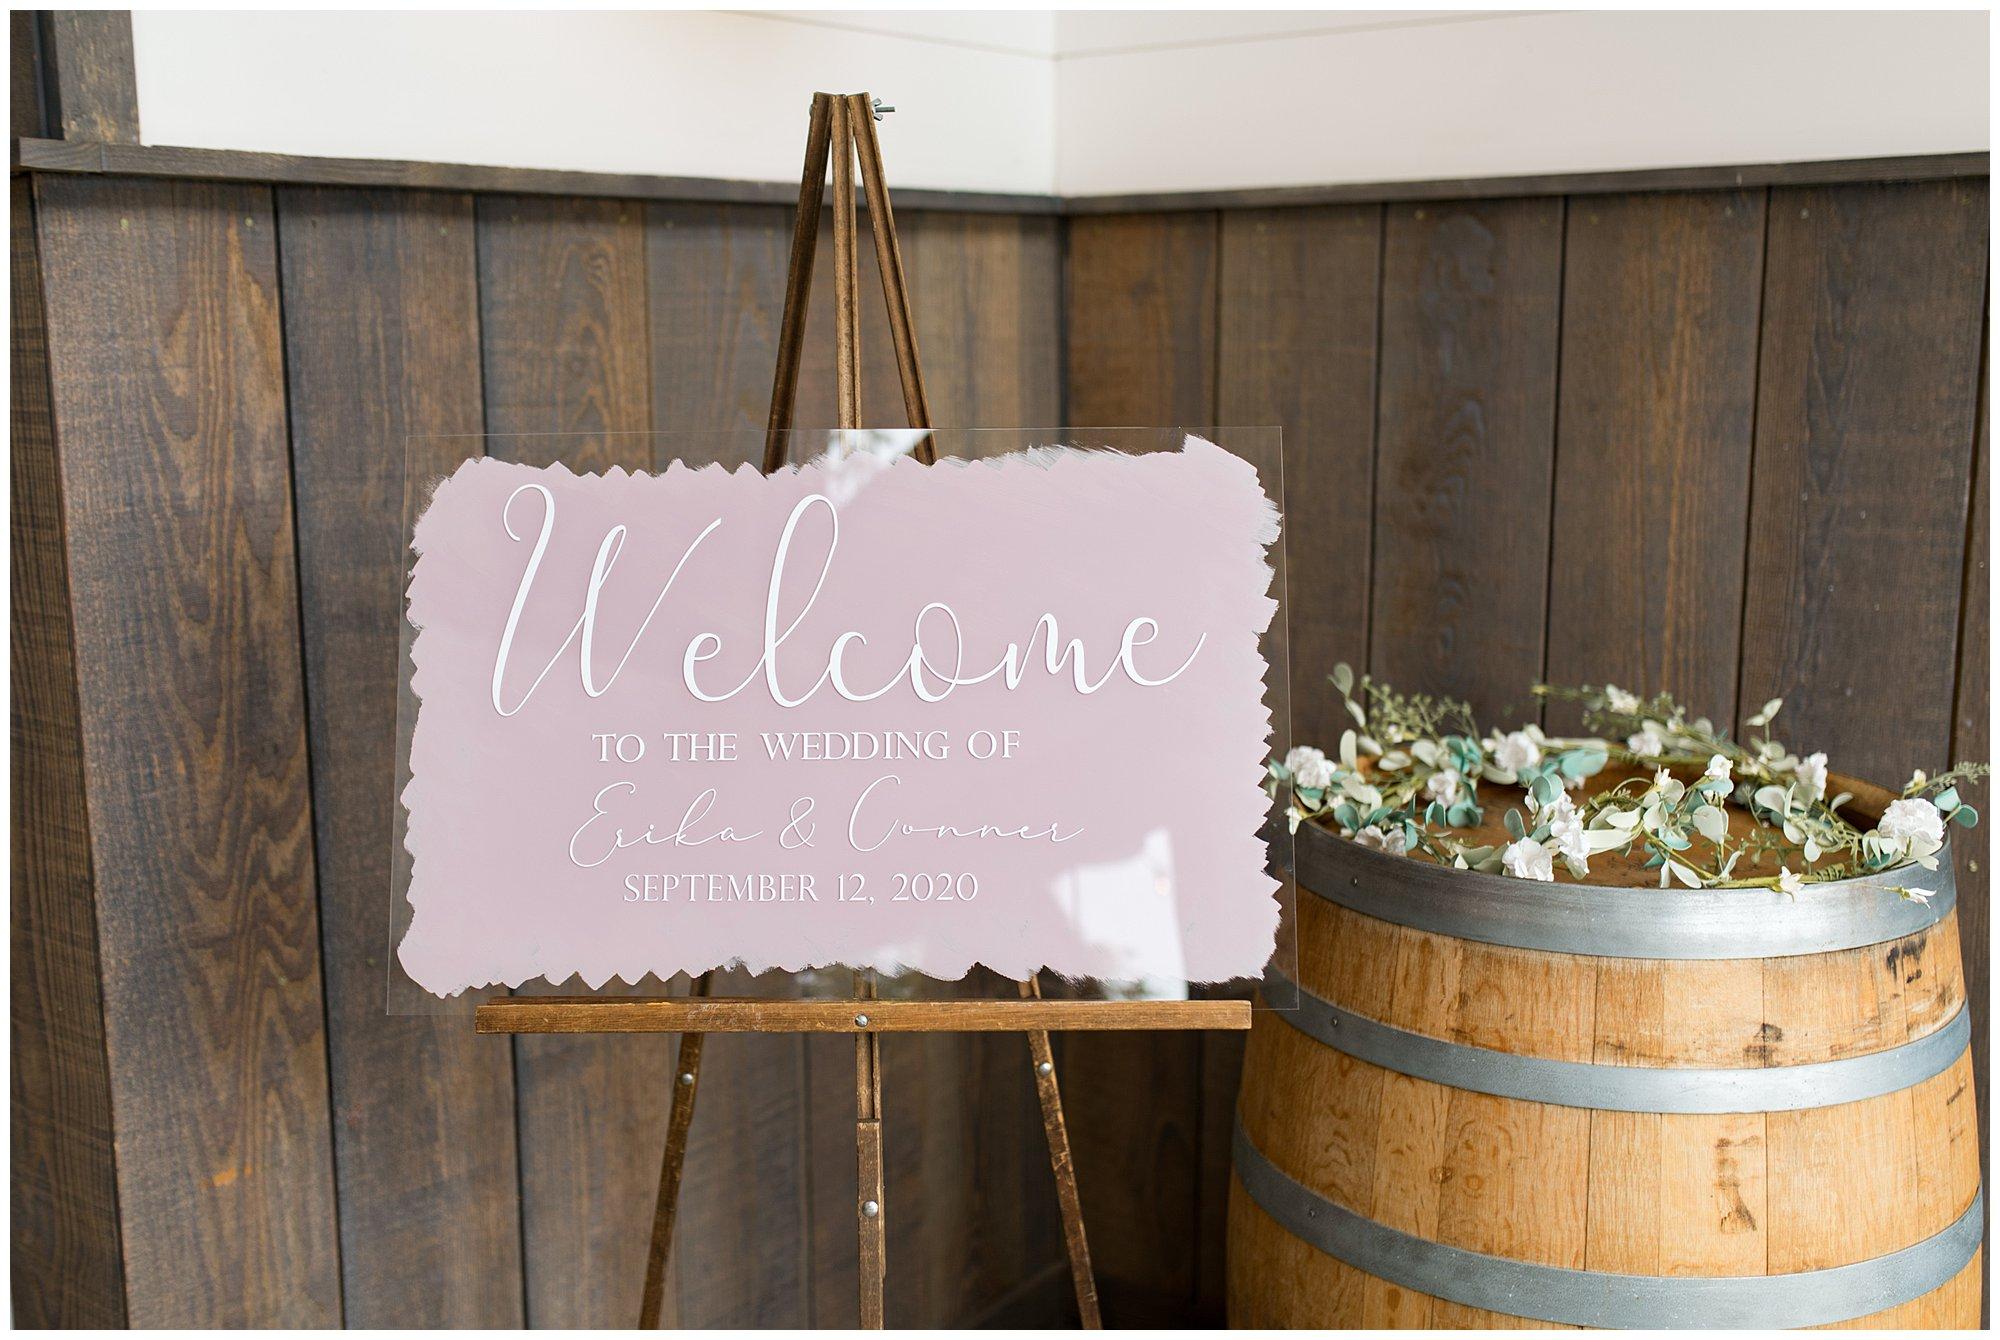 acrylic wedding sign at Union 12 wedding venue